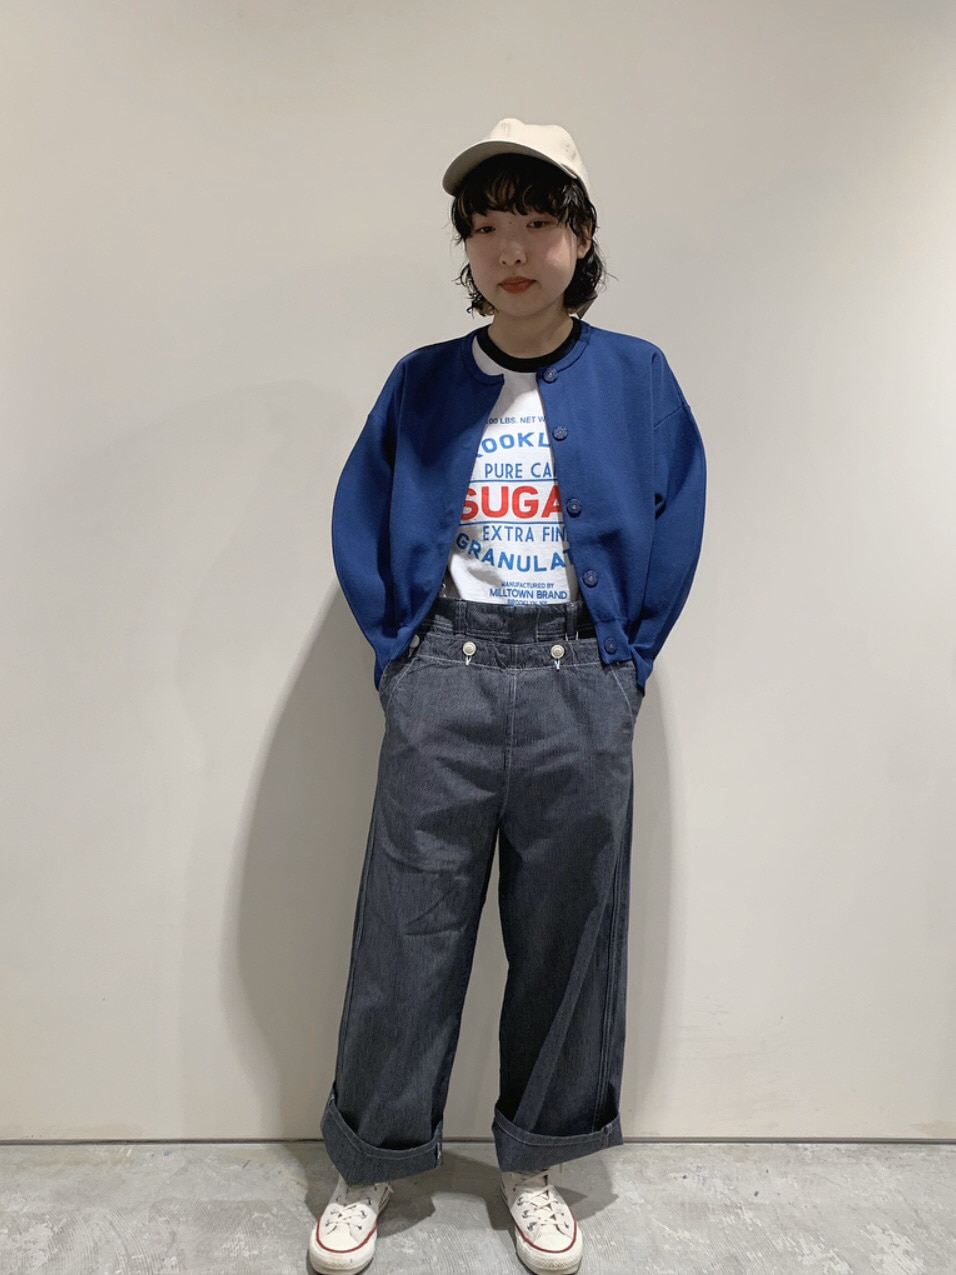 AMB SHOP CHILD WOMAN CHILD WOMAN , PAR ICI ルミネ横浜 身長:157cm 2020.07.21